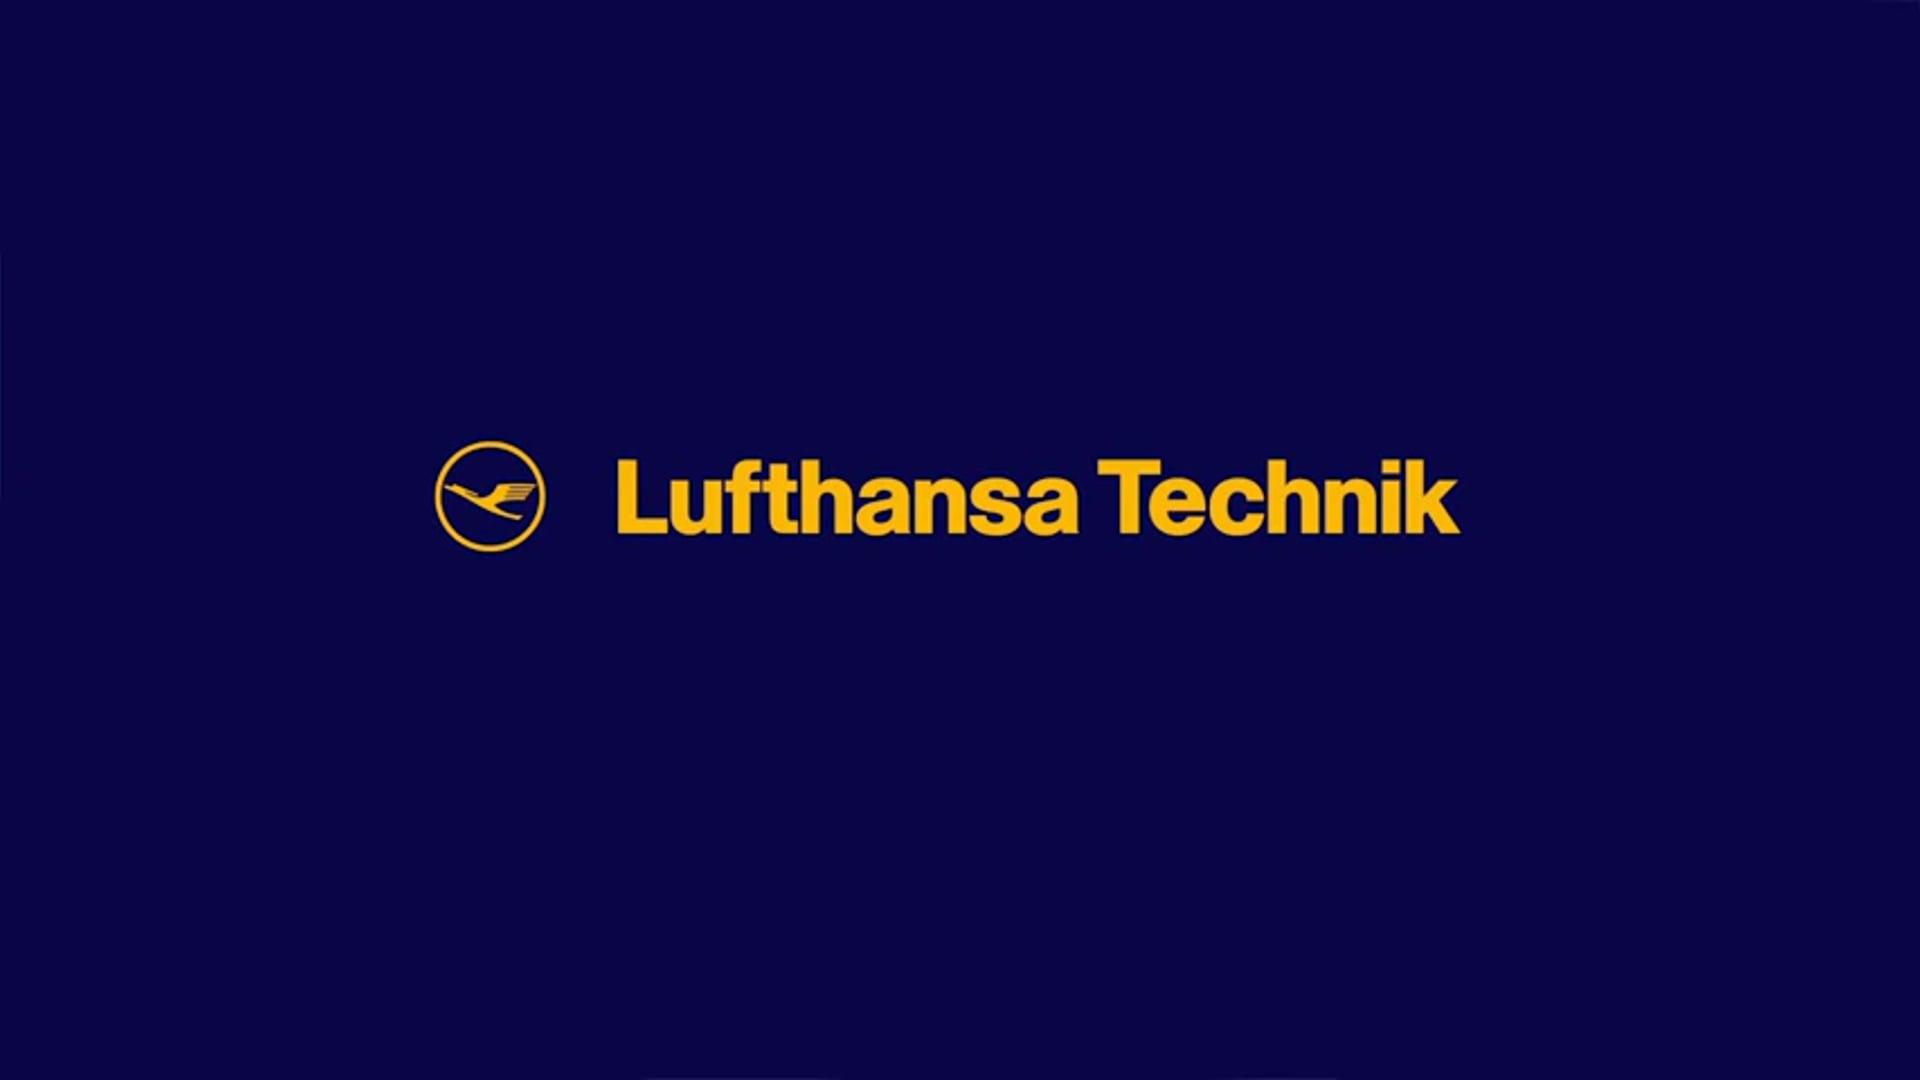 Image Film: Lufthansa Technik